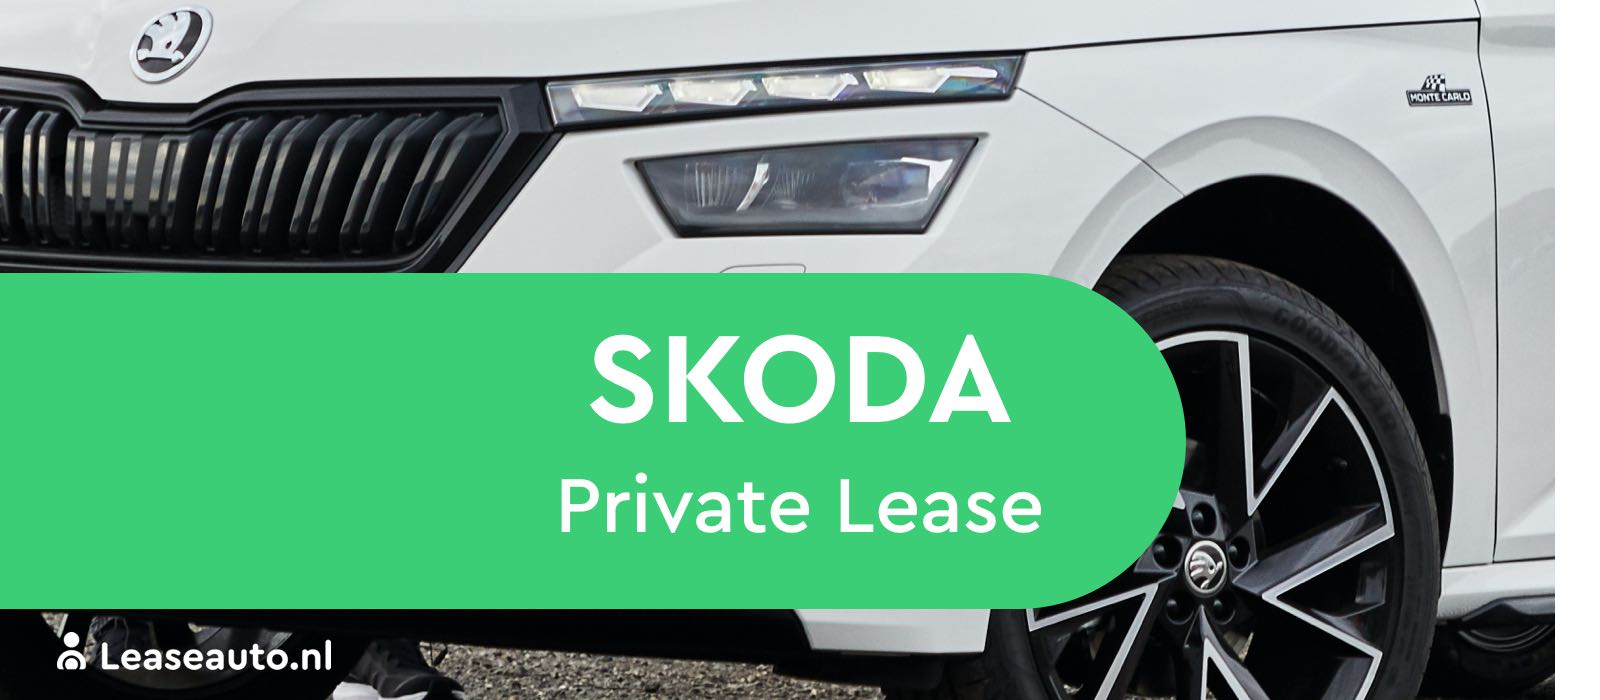 SKODA Private Lease